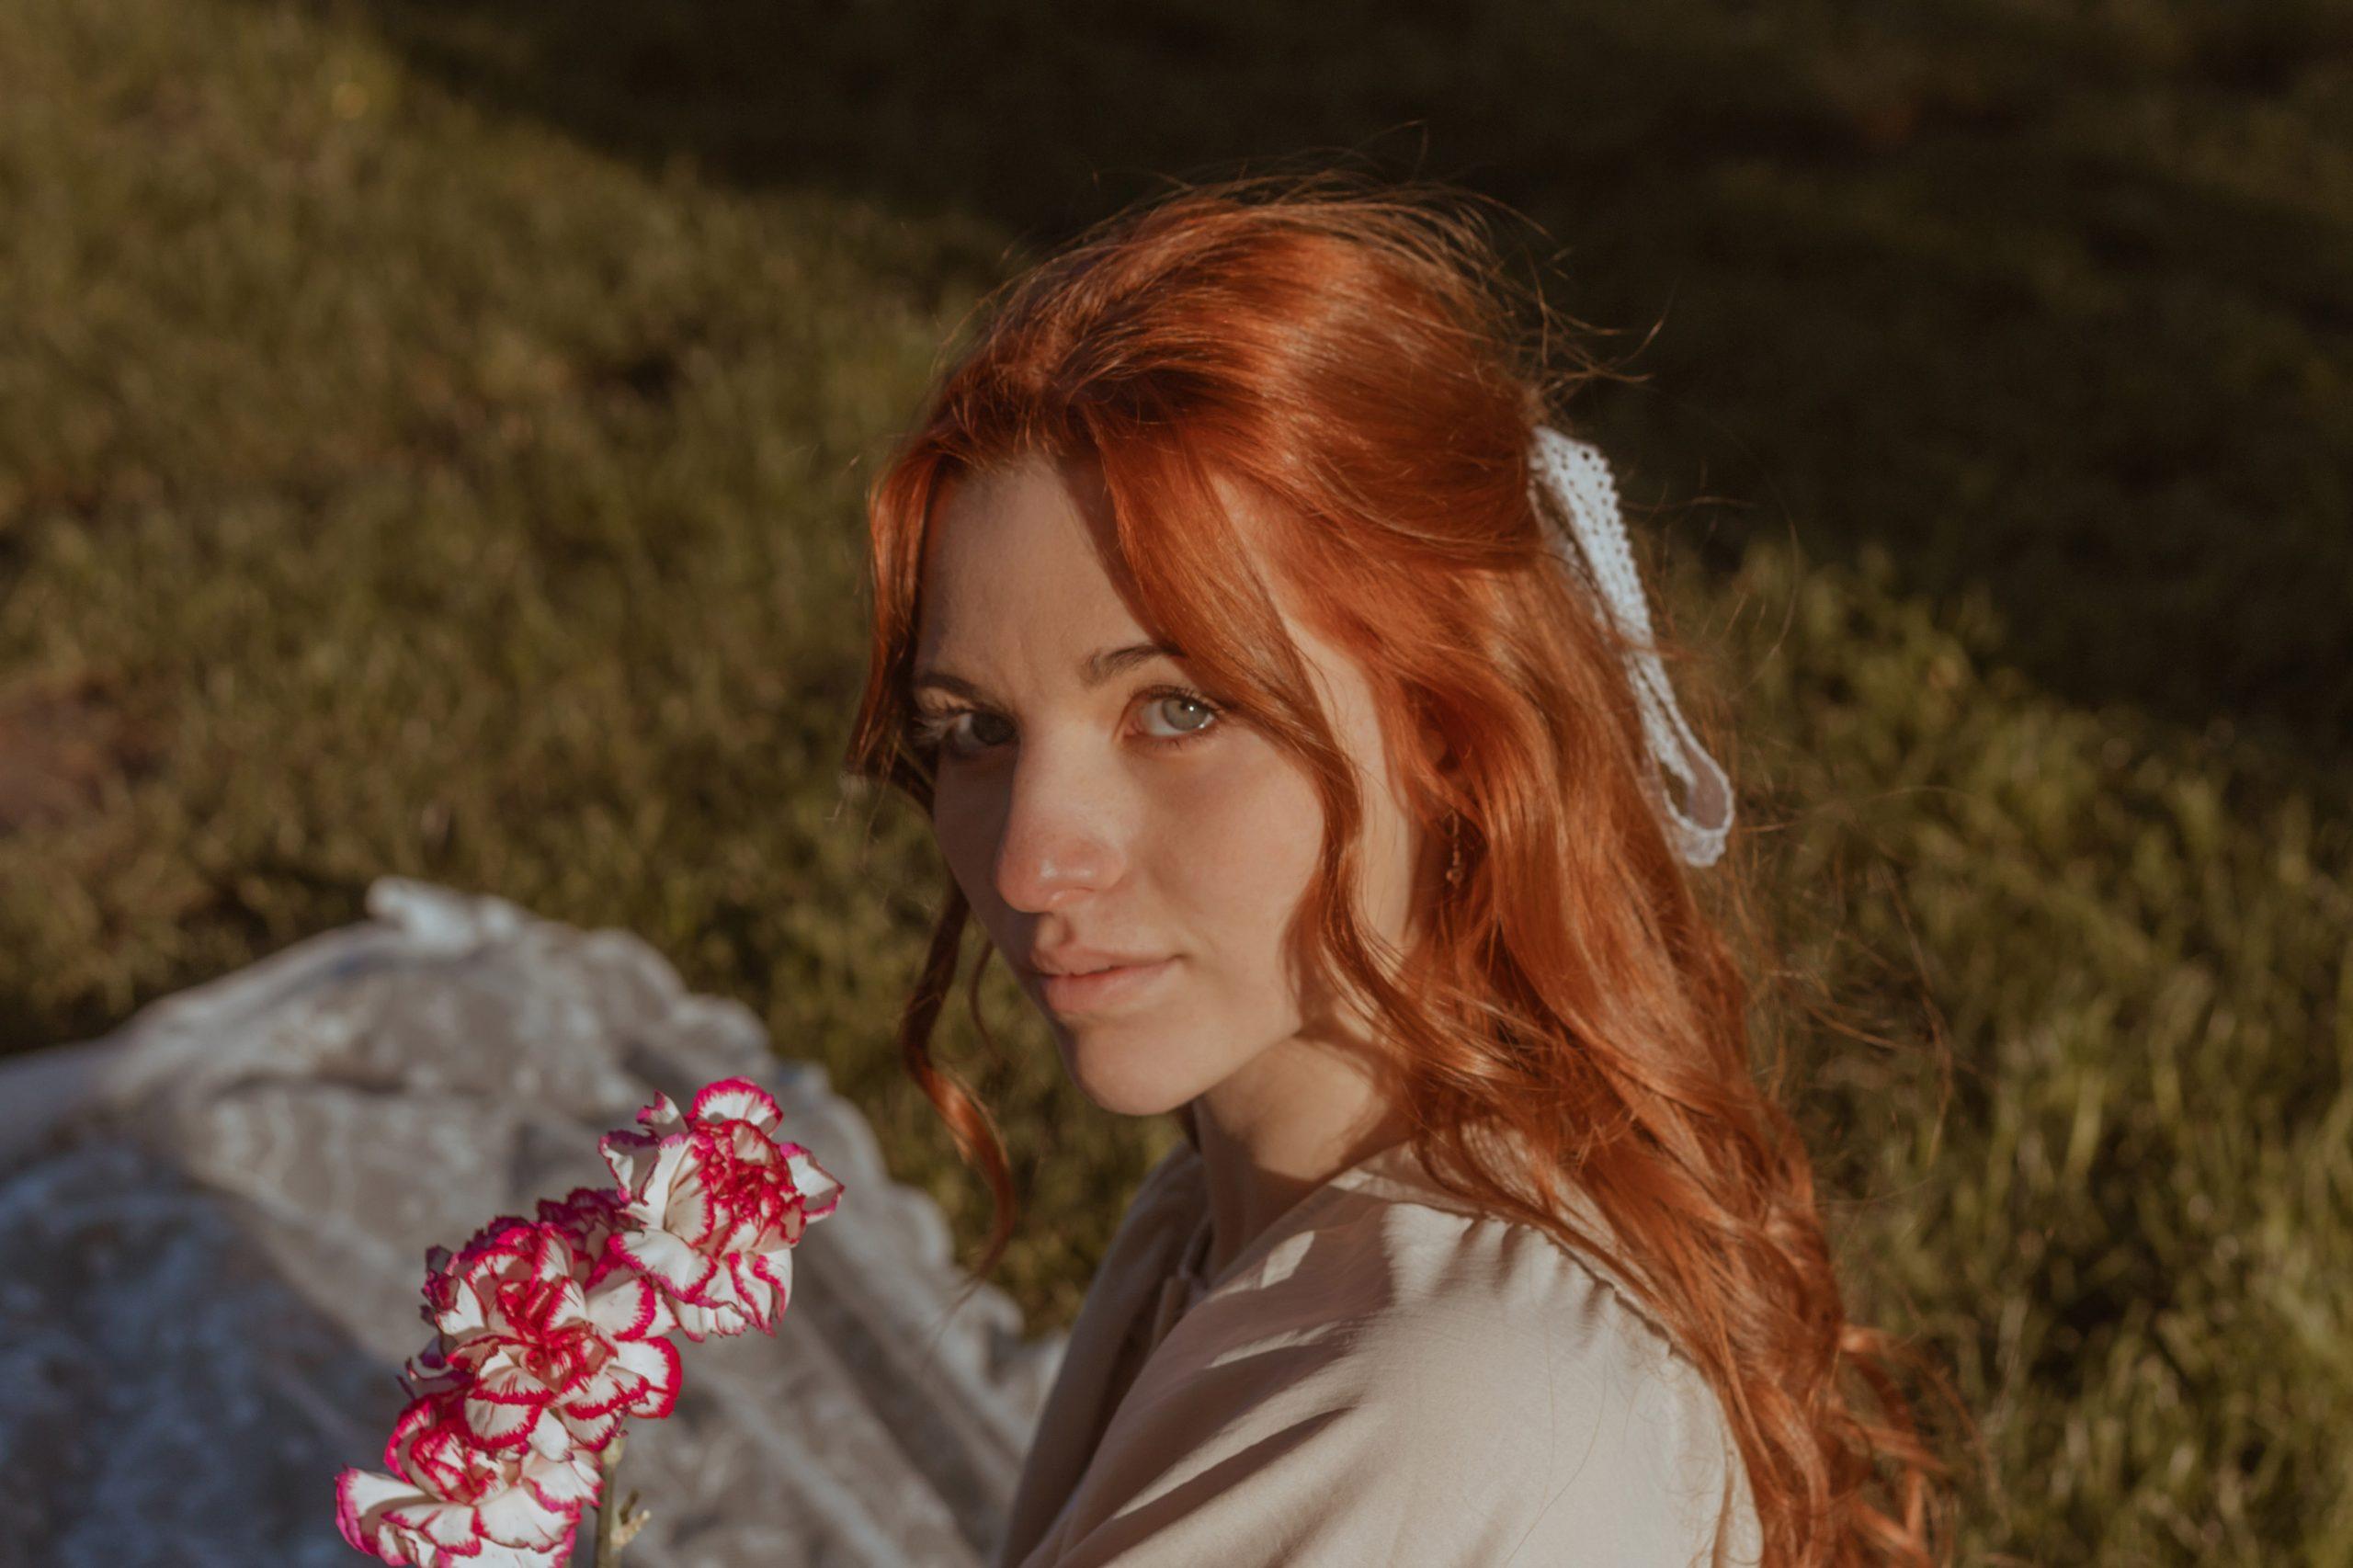 Categorie: Glamour, Portrait - Photographer: ILARIA PUNZO - Model: FRANCESCA TARTARI - Location: Ferrara, FE, Italia